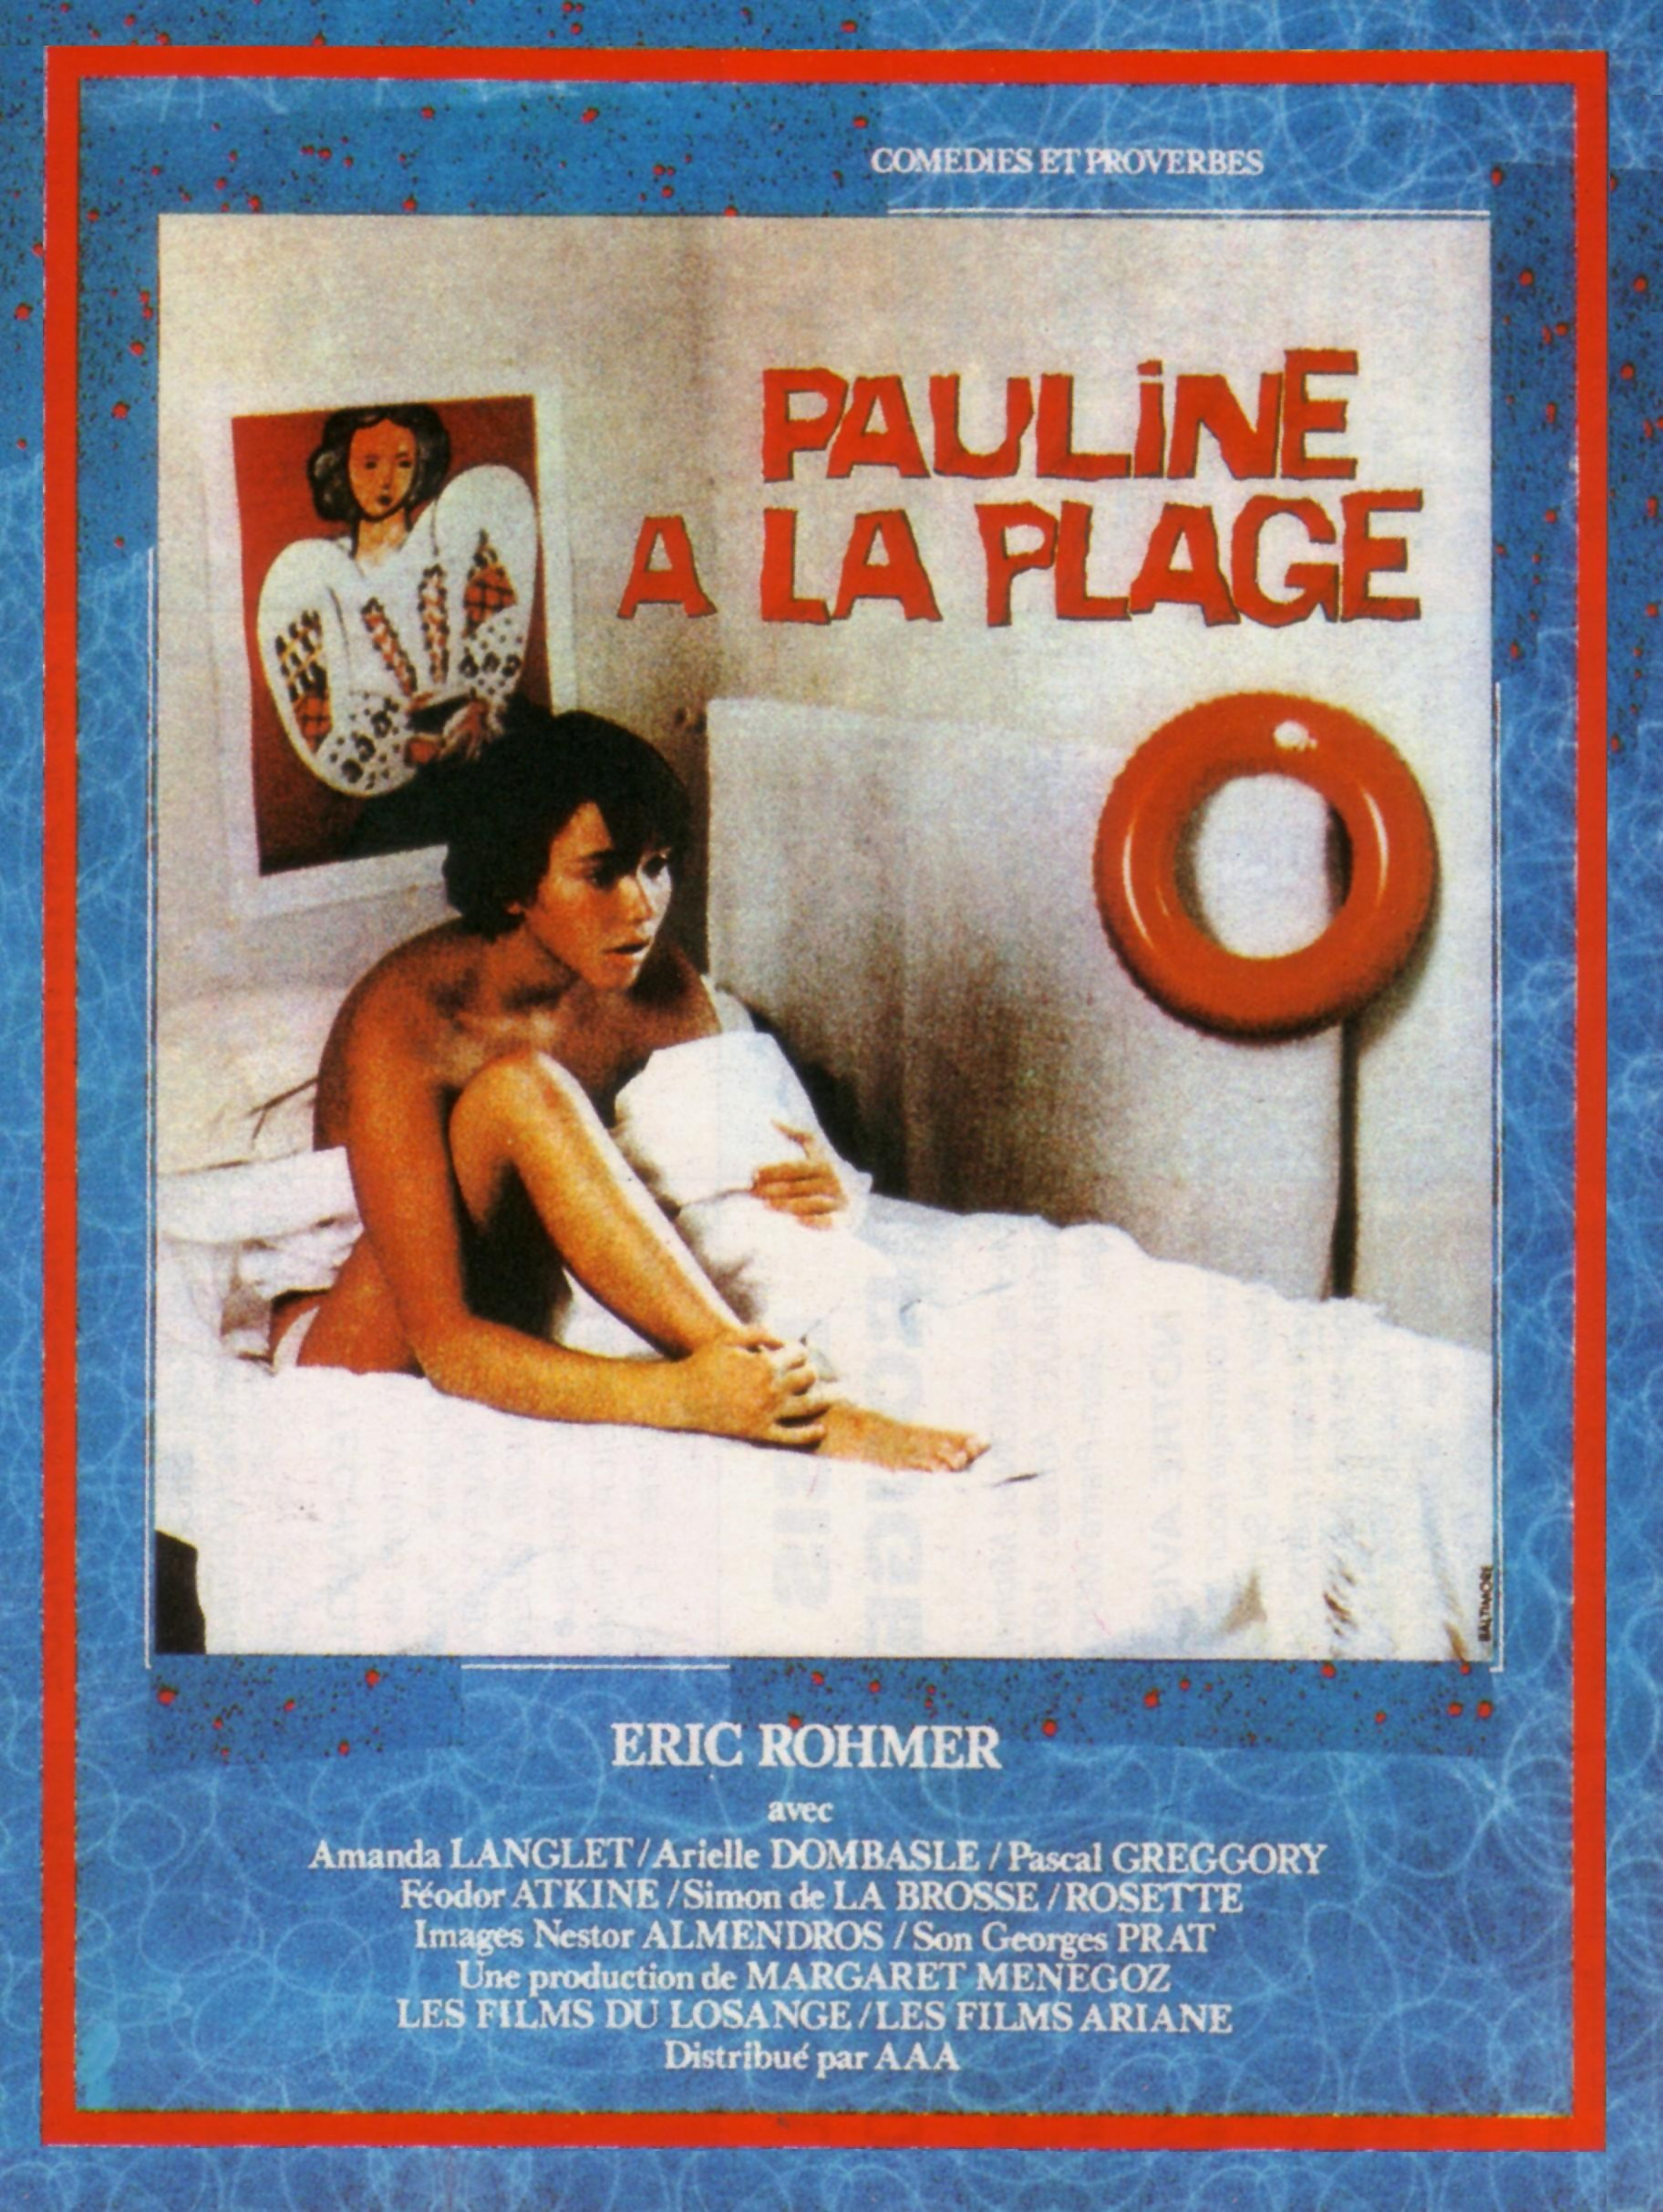 1983-pauline-a-la-plage-pauline-en-la-playa-fra-01.jpg